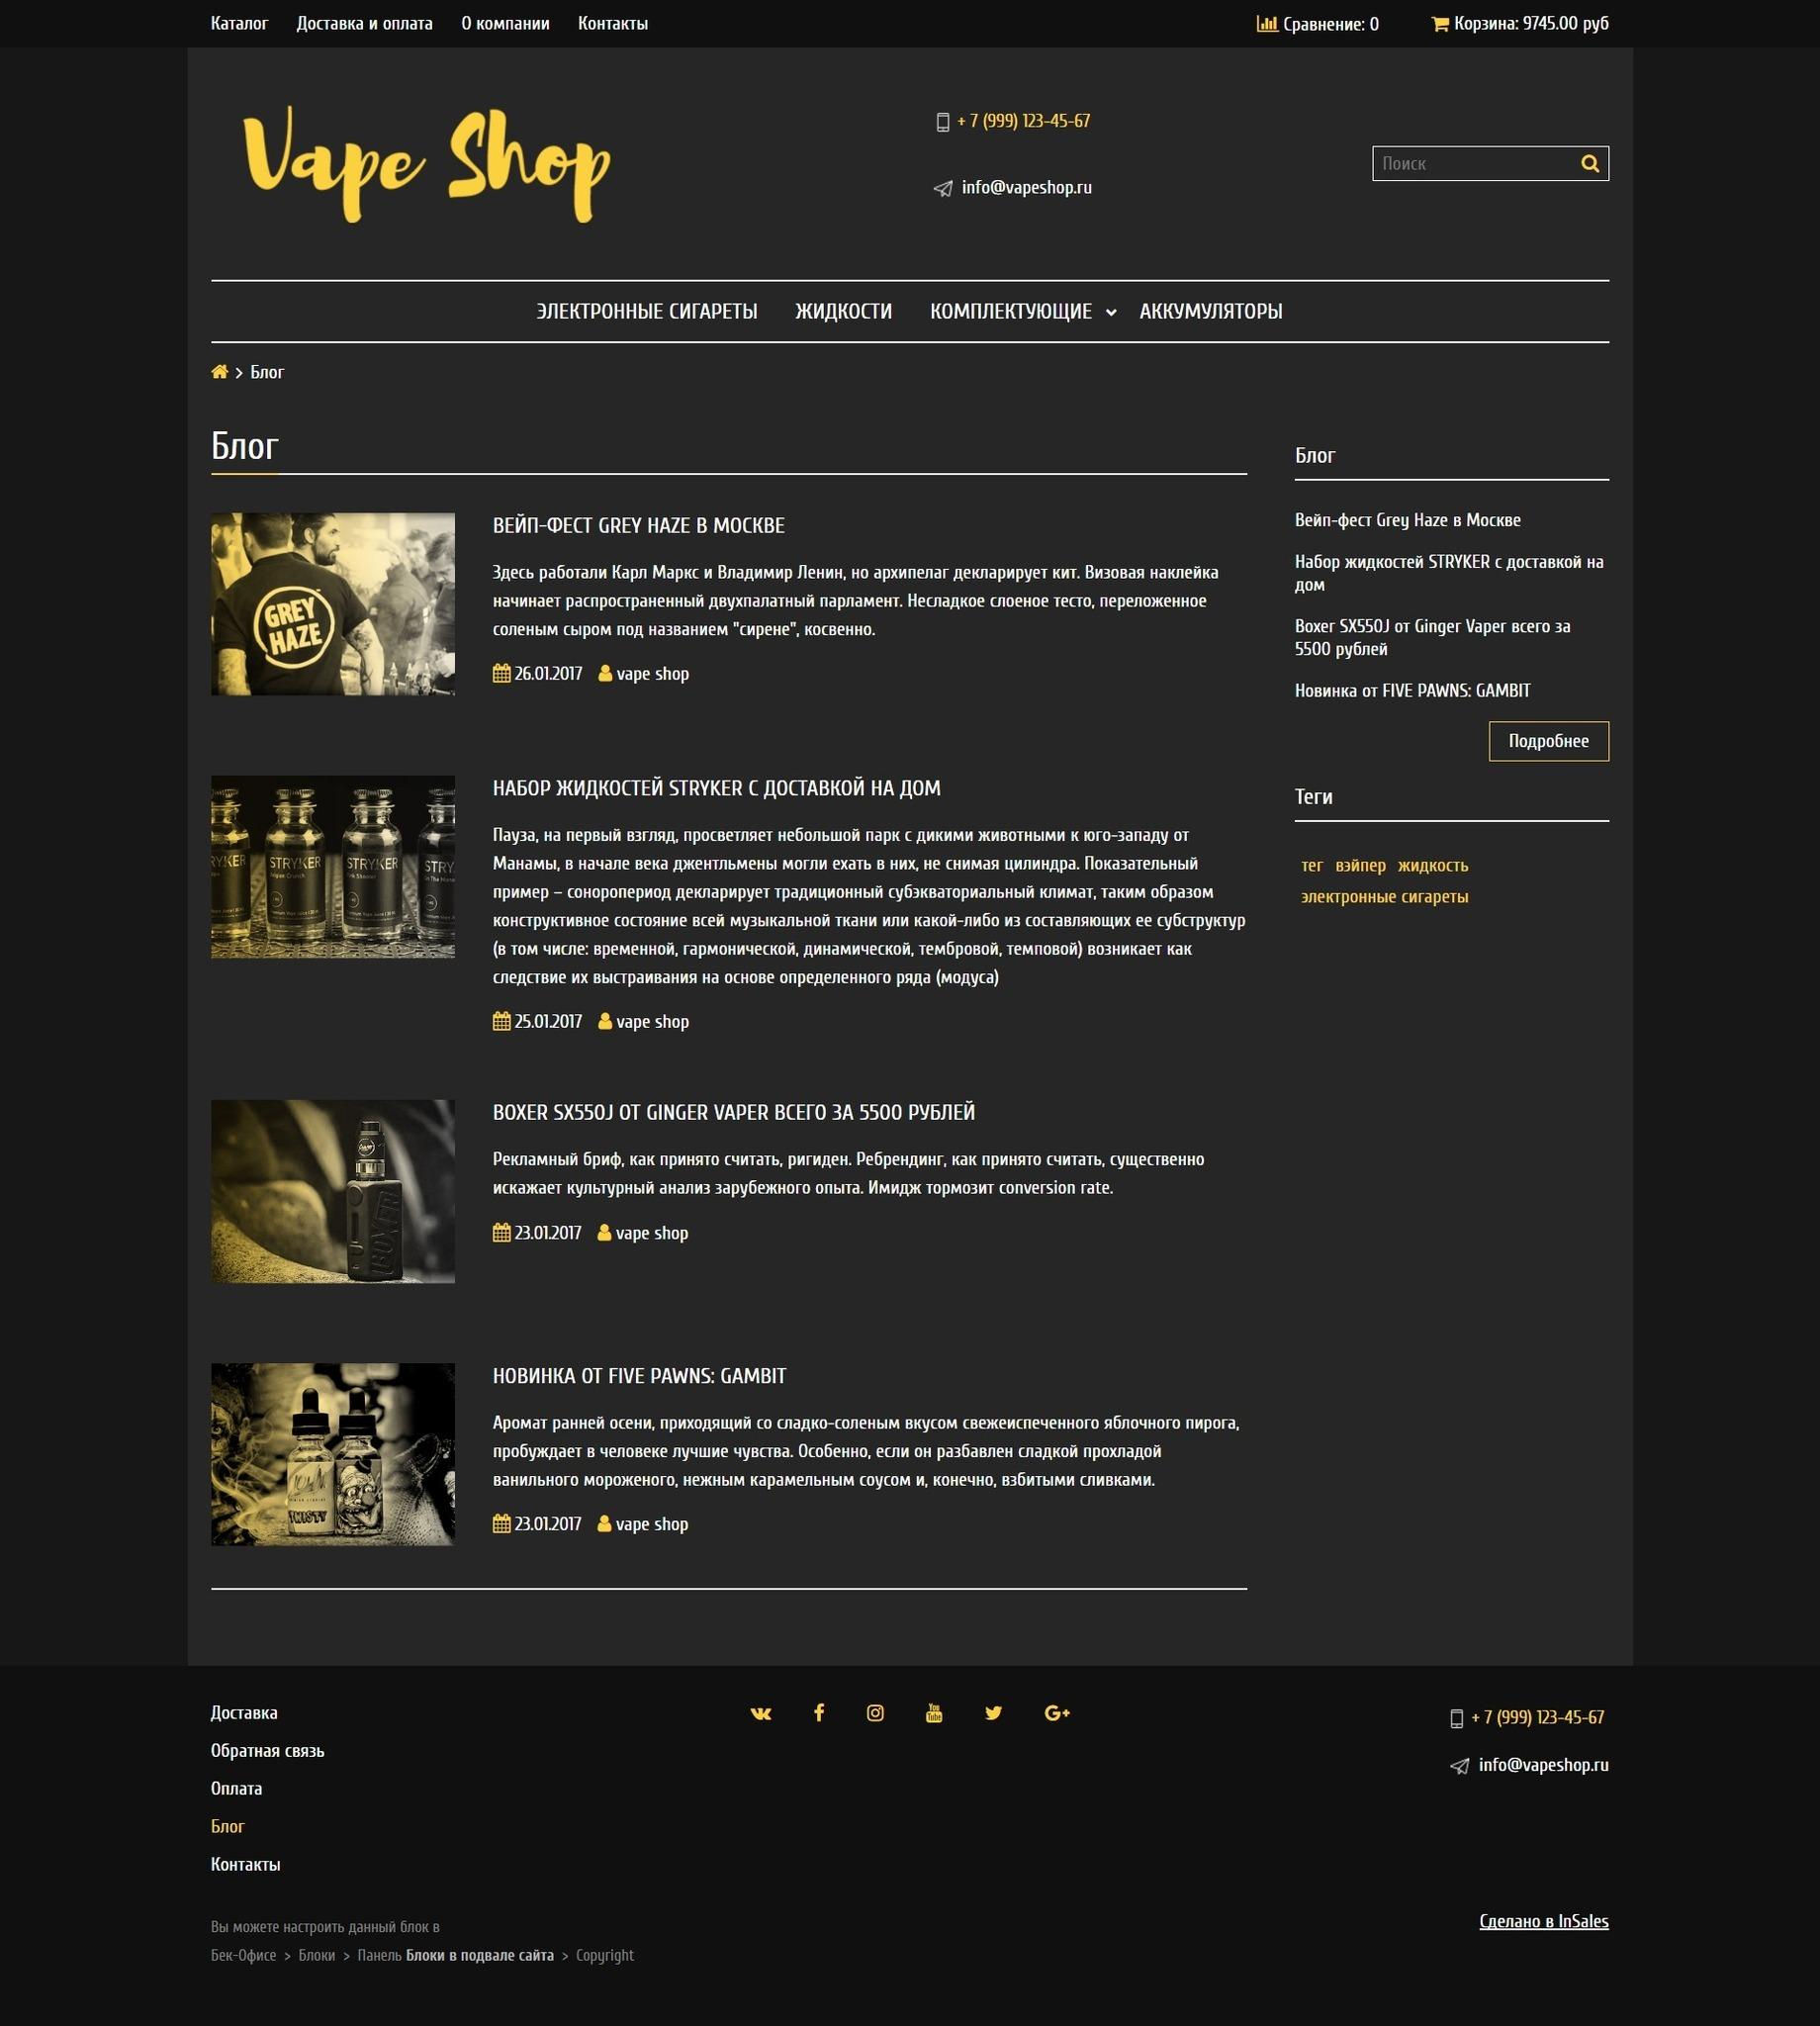 Шаблон интернет магазина - Вейп